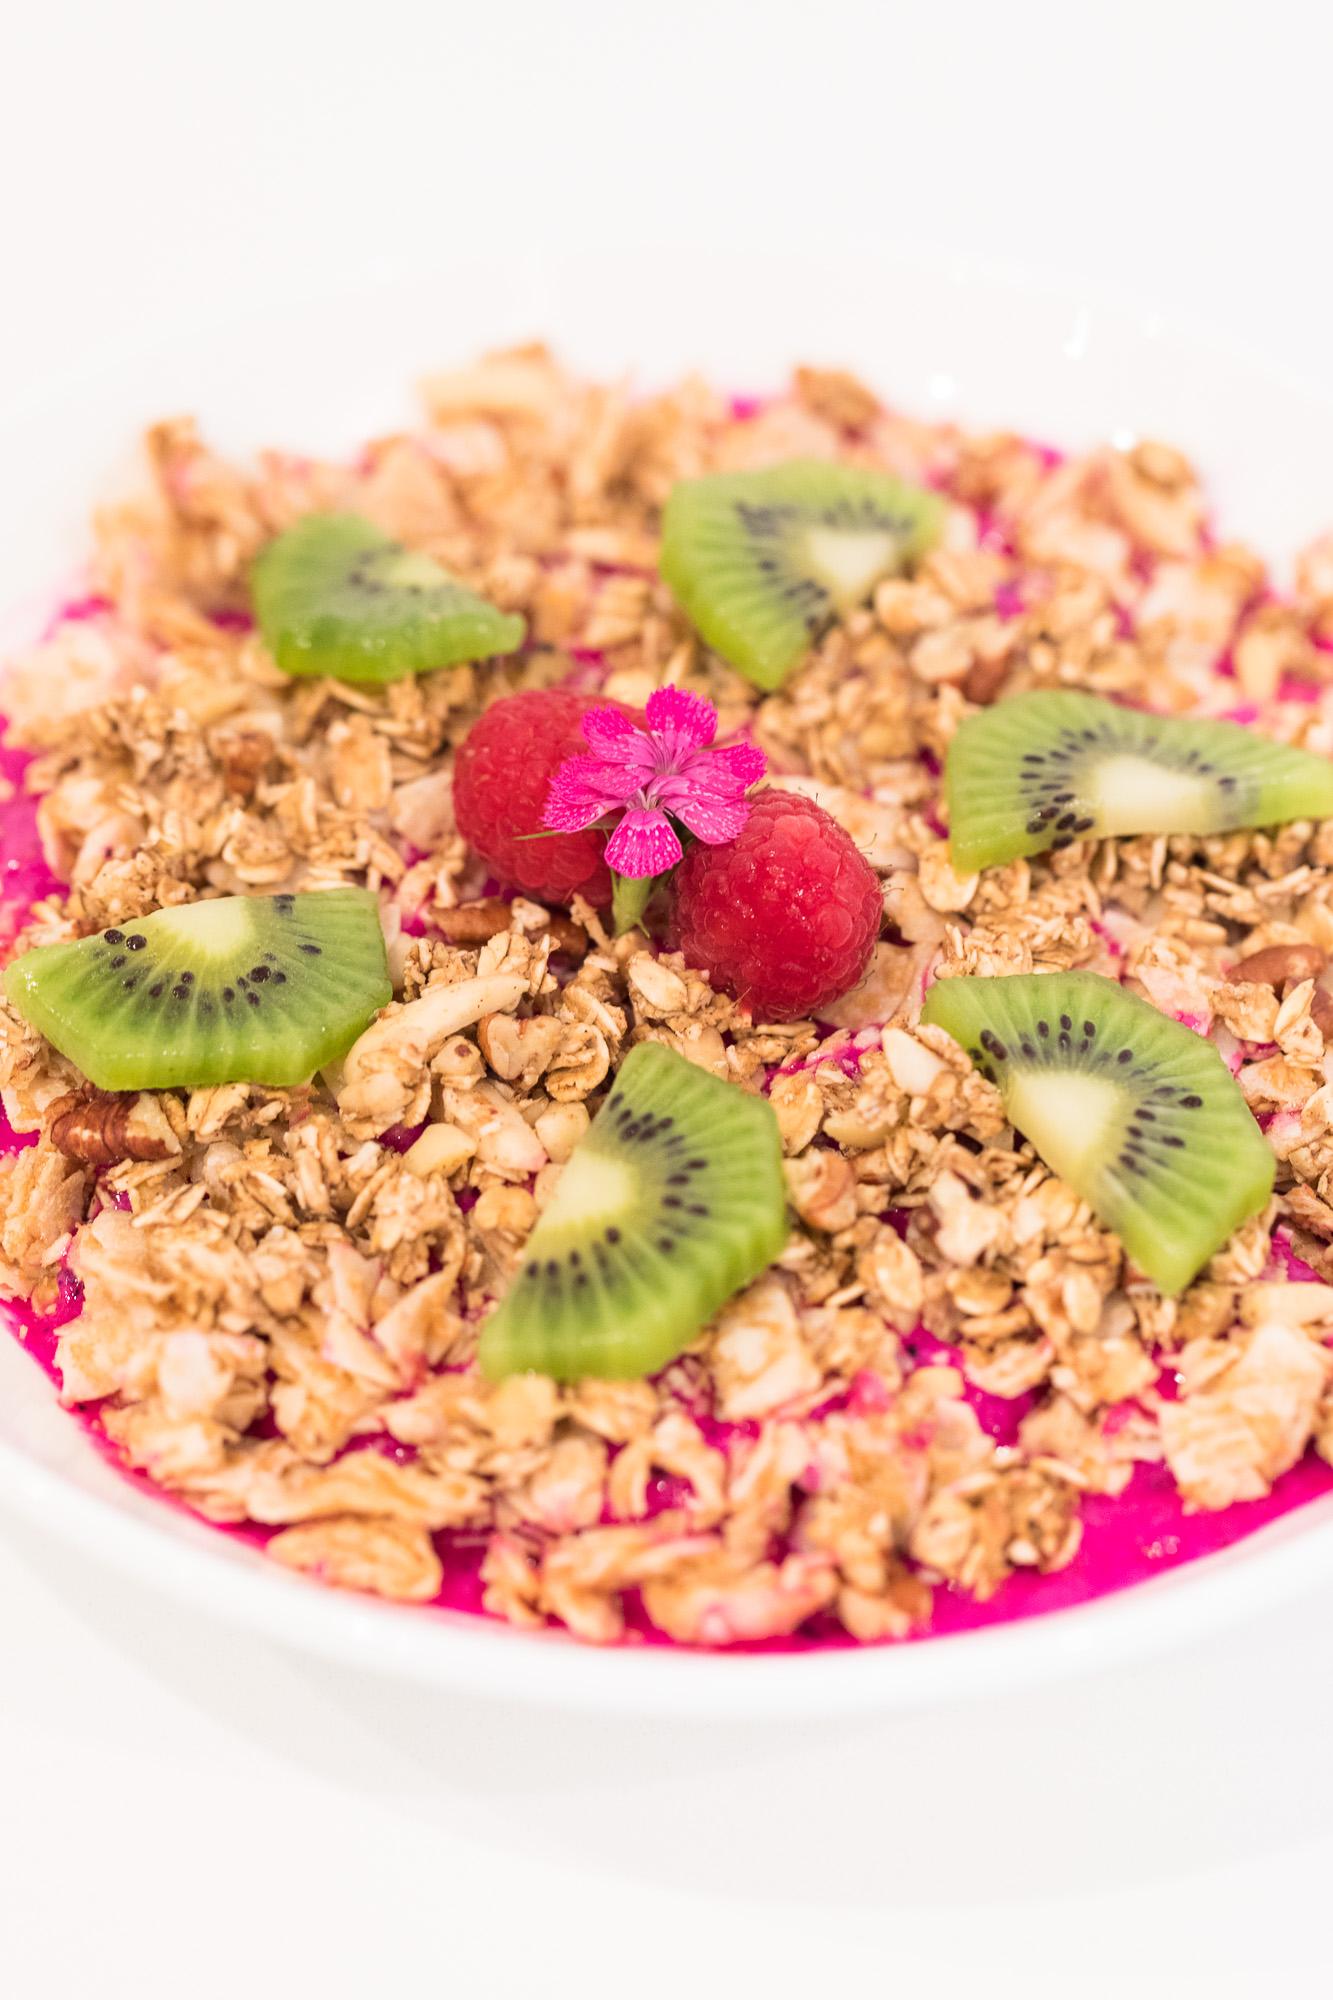 maka-vegan-gluten-free-cafe-breakfast-bowl-12.jpg